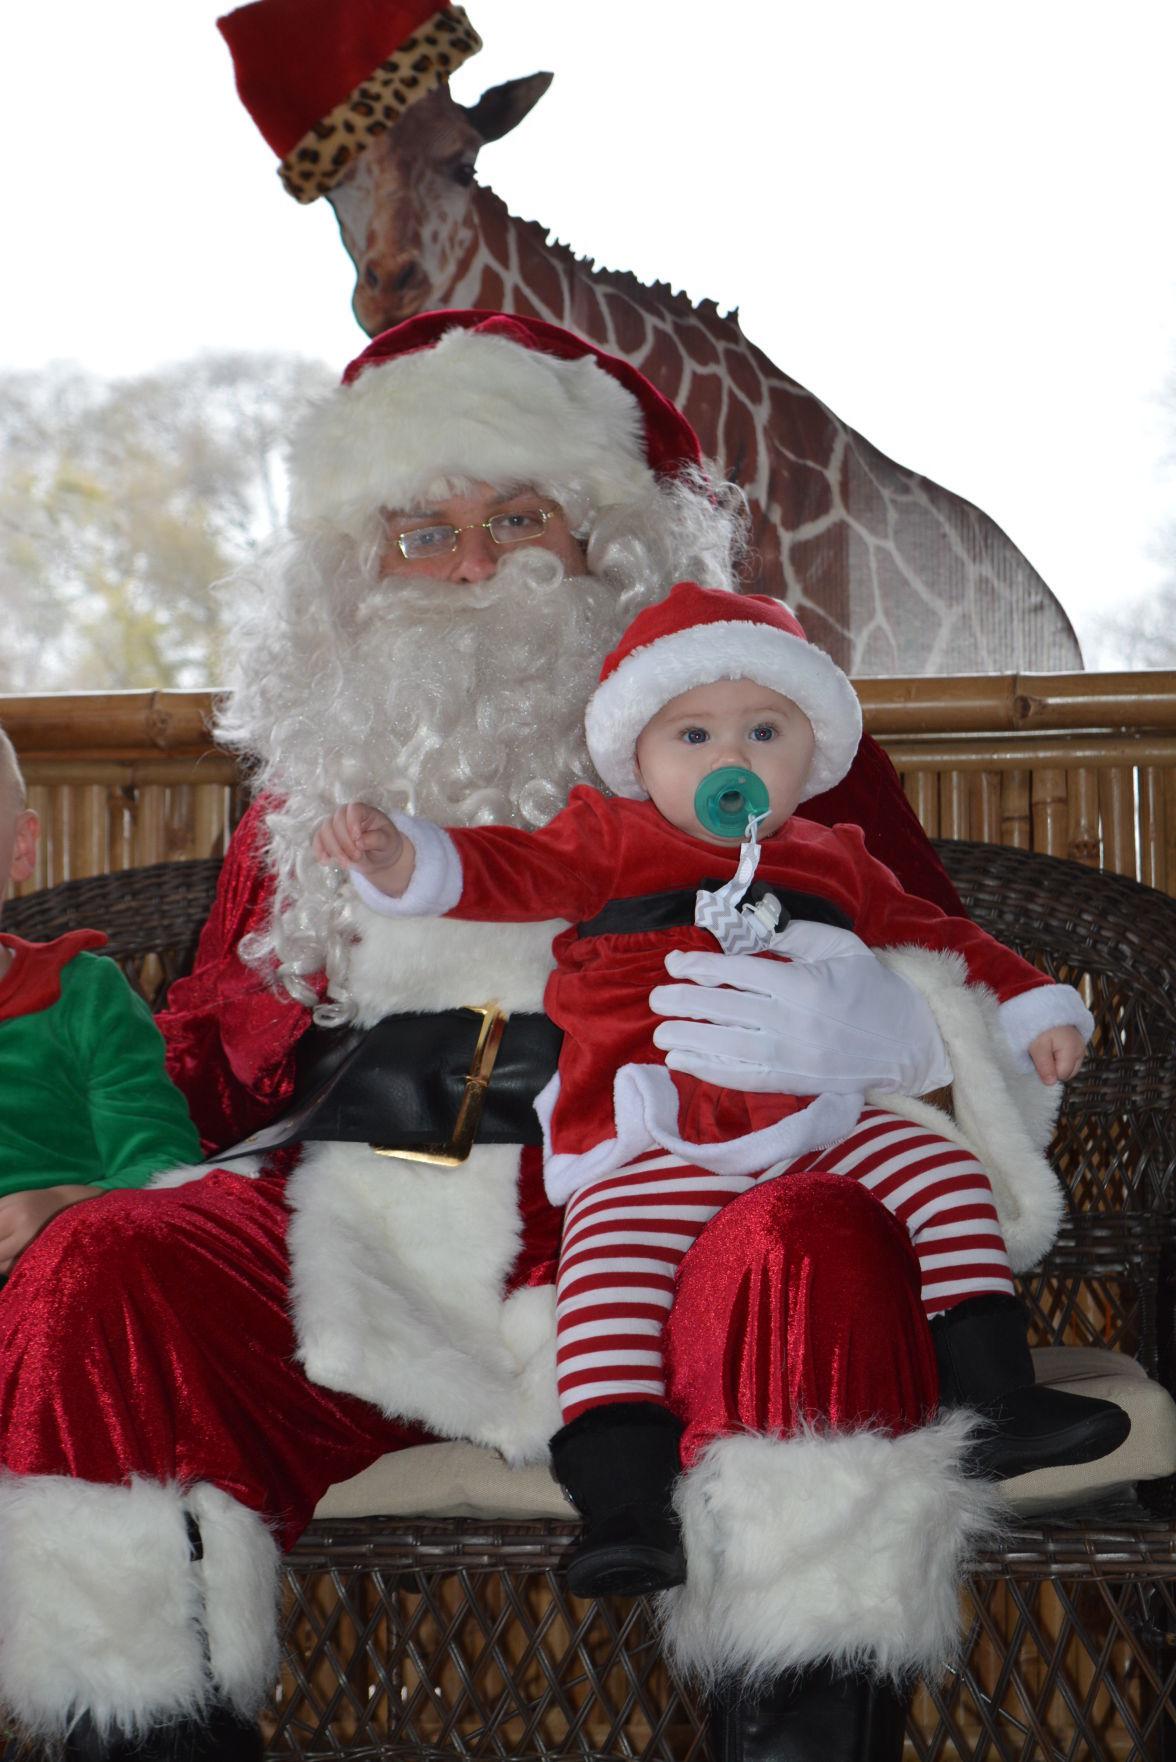 Brunch with Santa at zoo